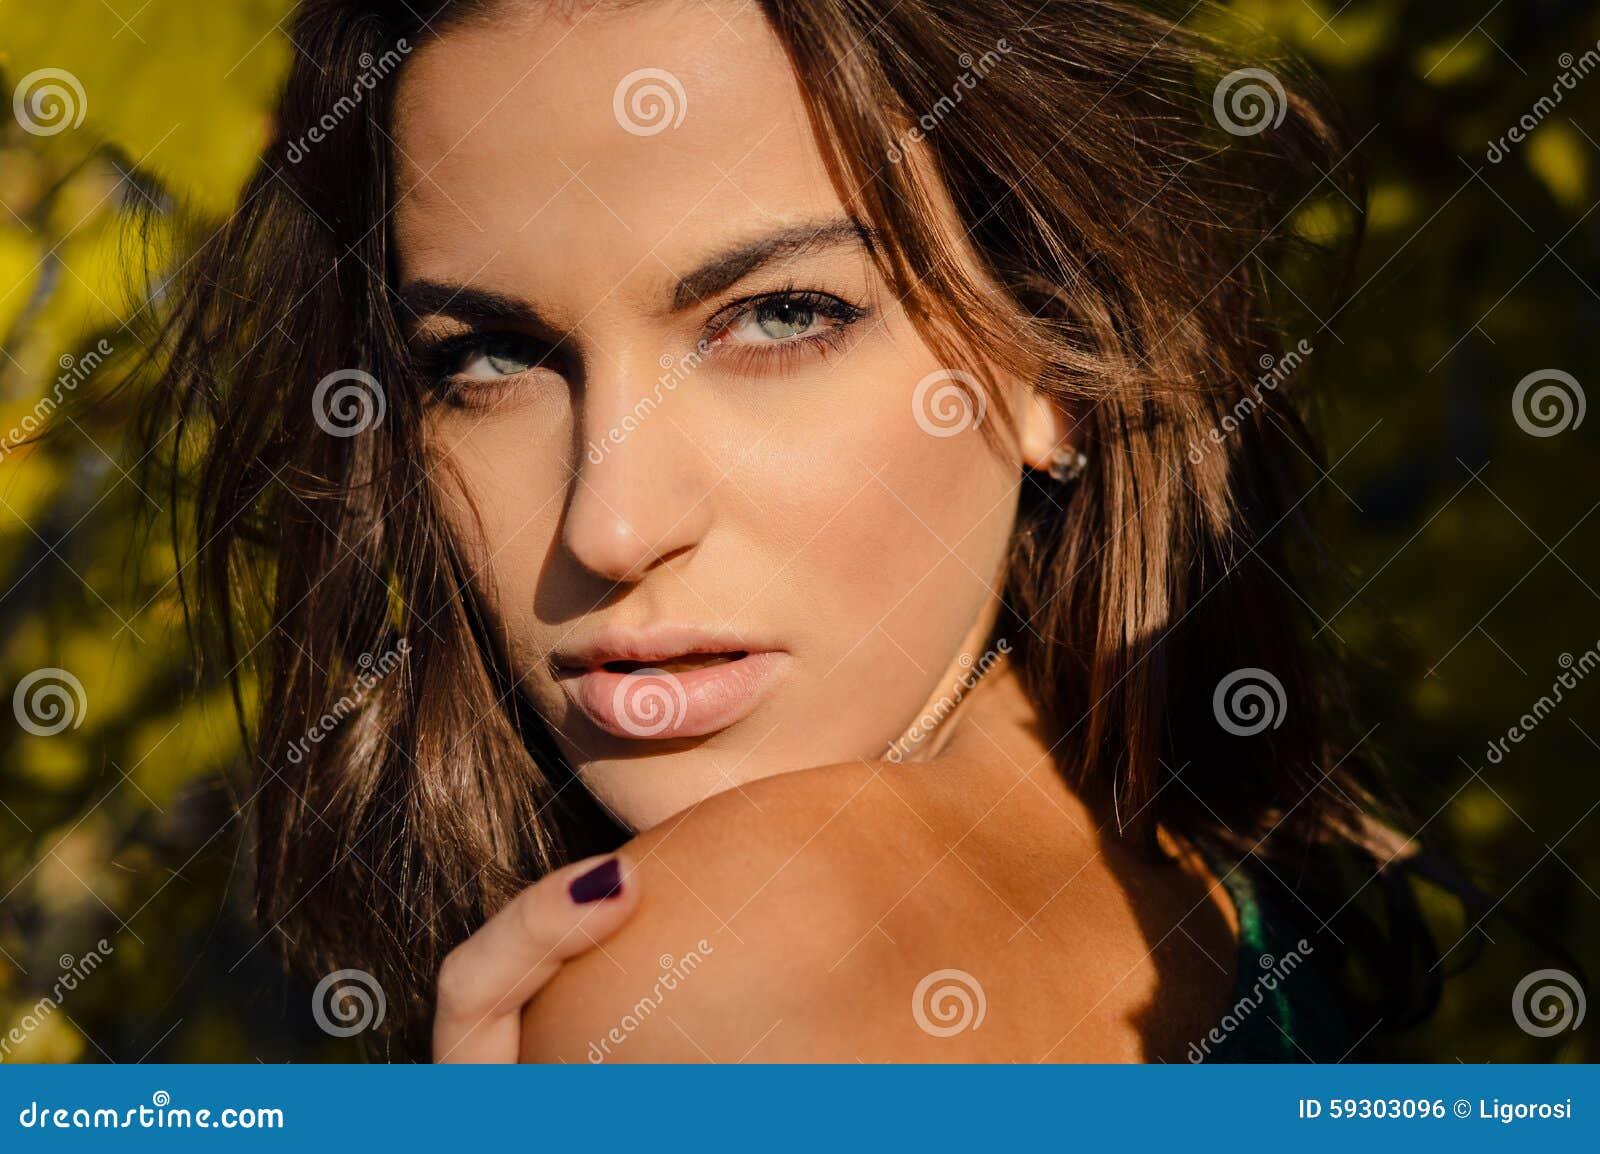 menina nua mulheres safadas